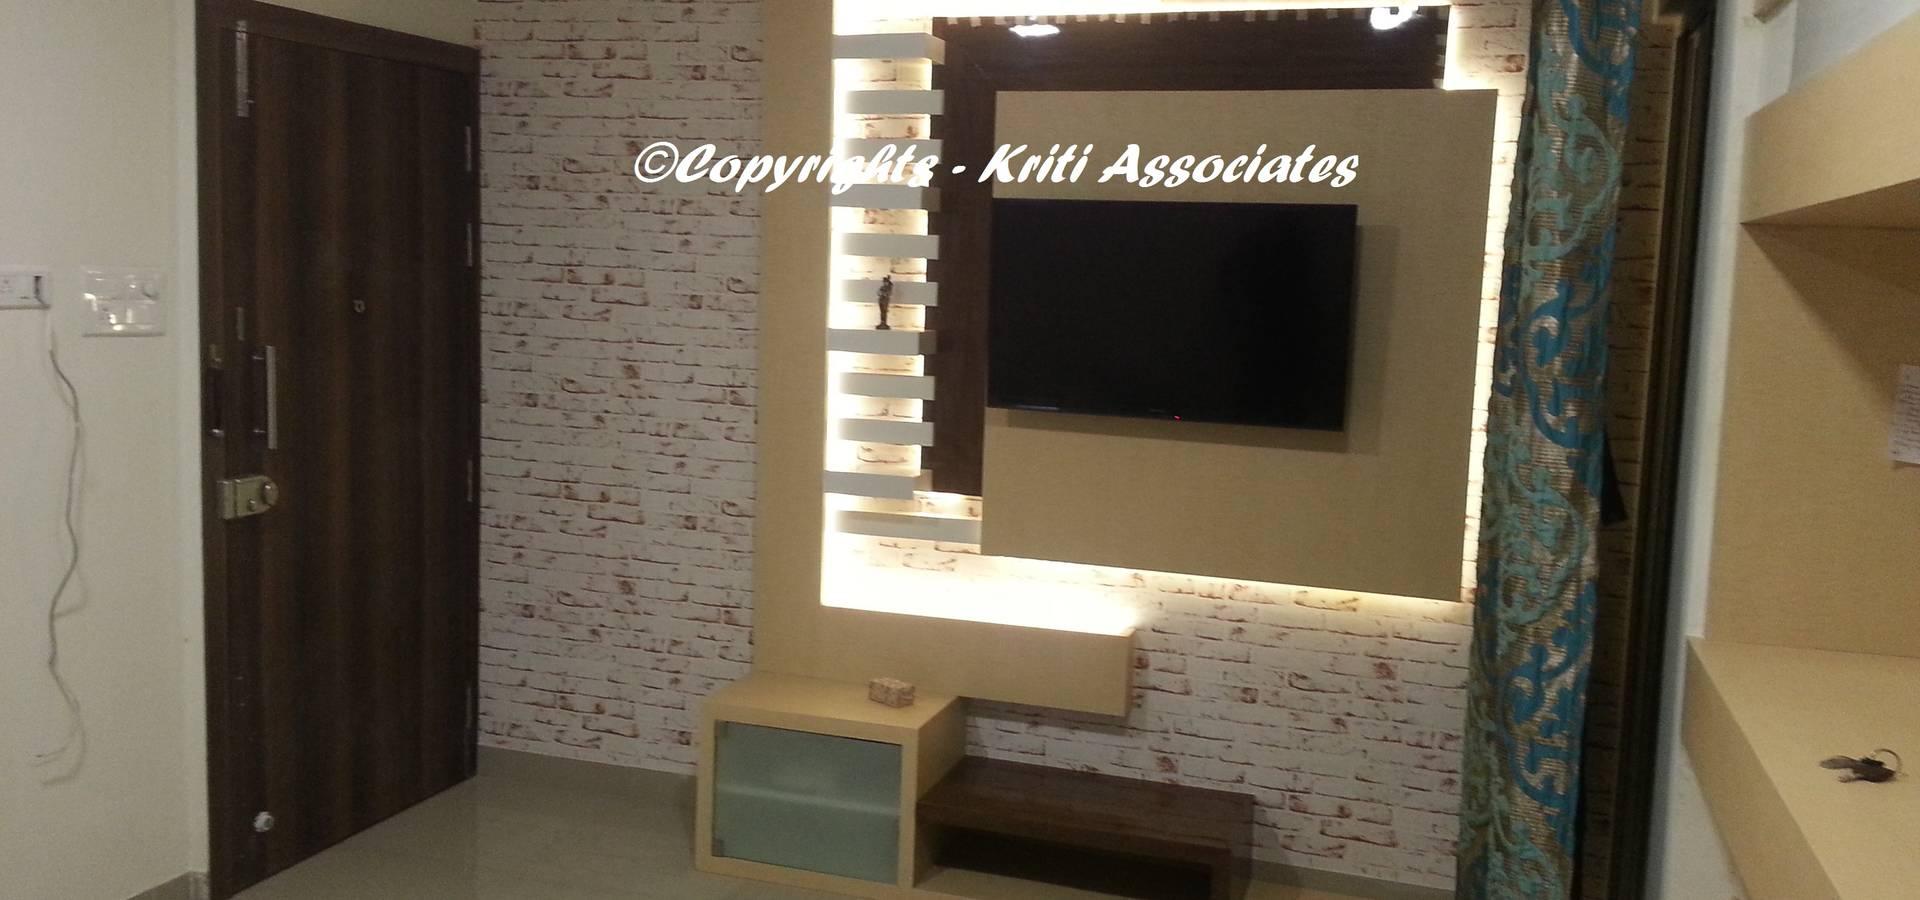 Kriti Associates / girishsdesigns